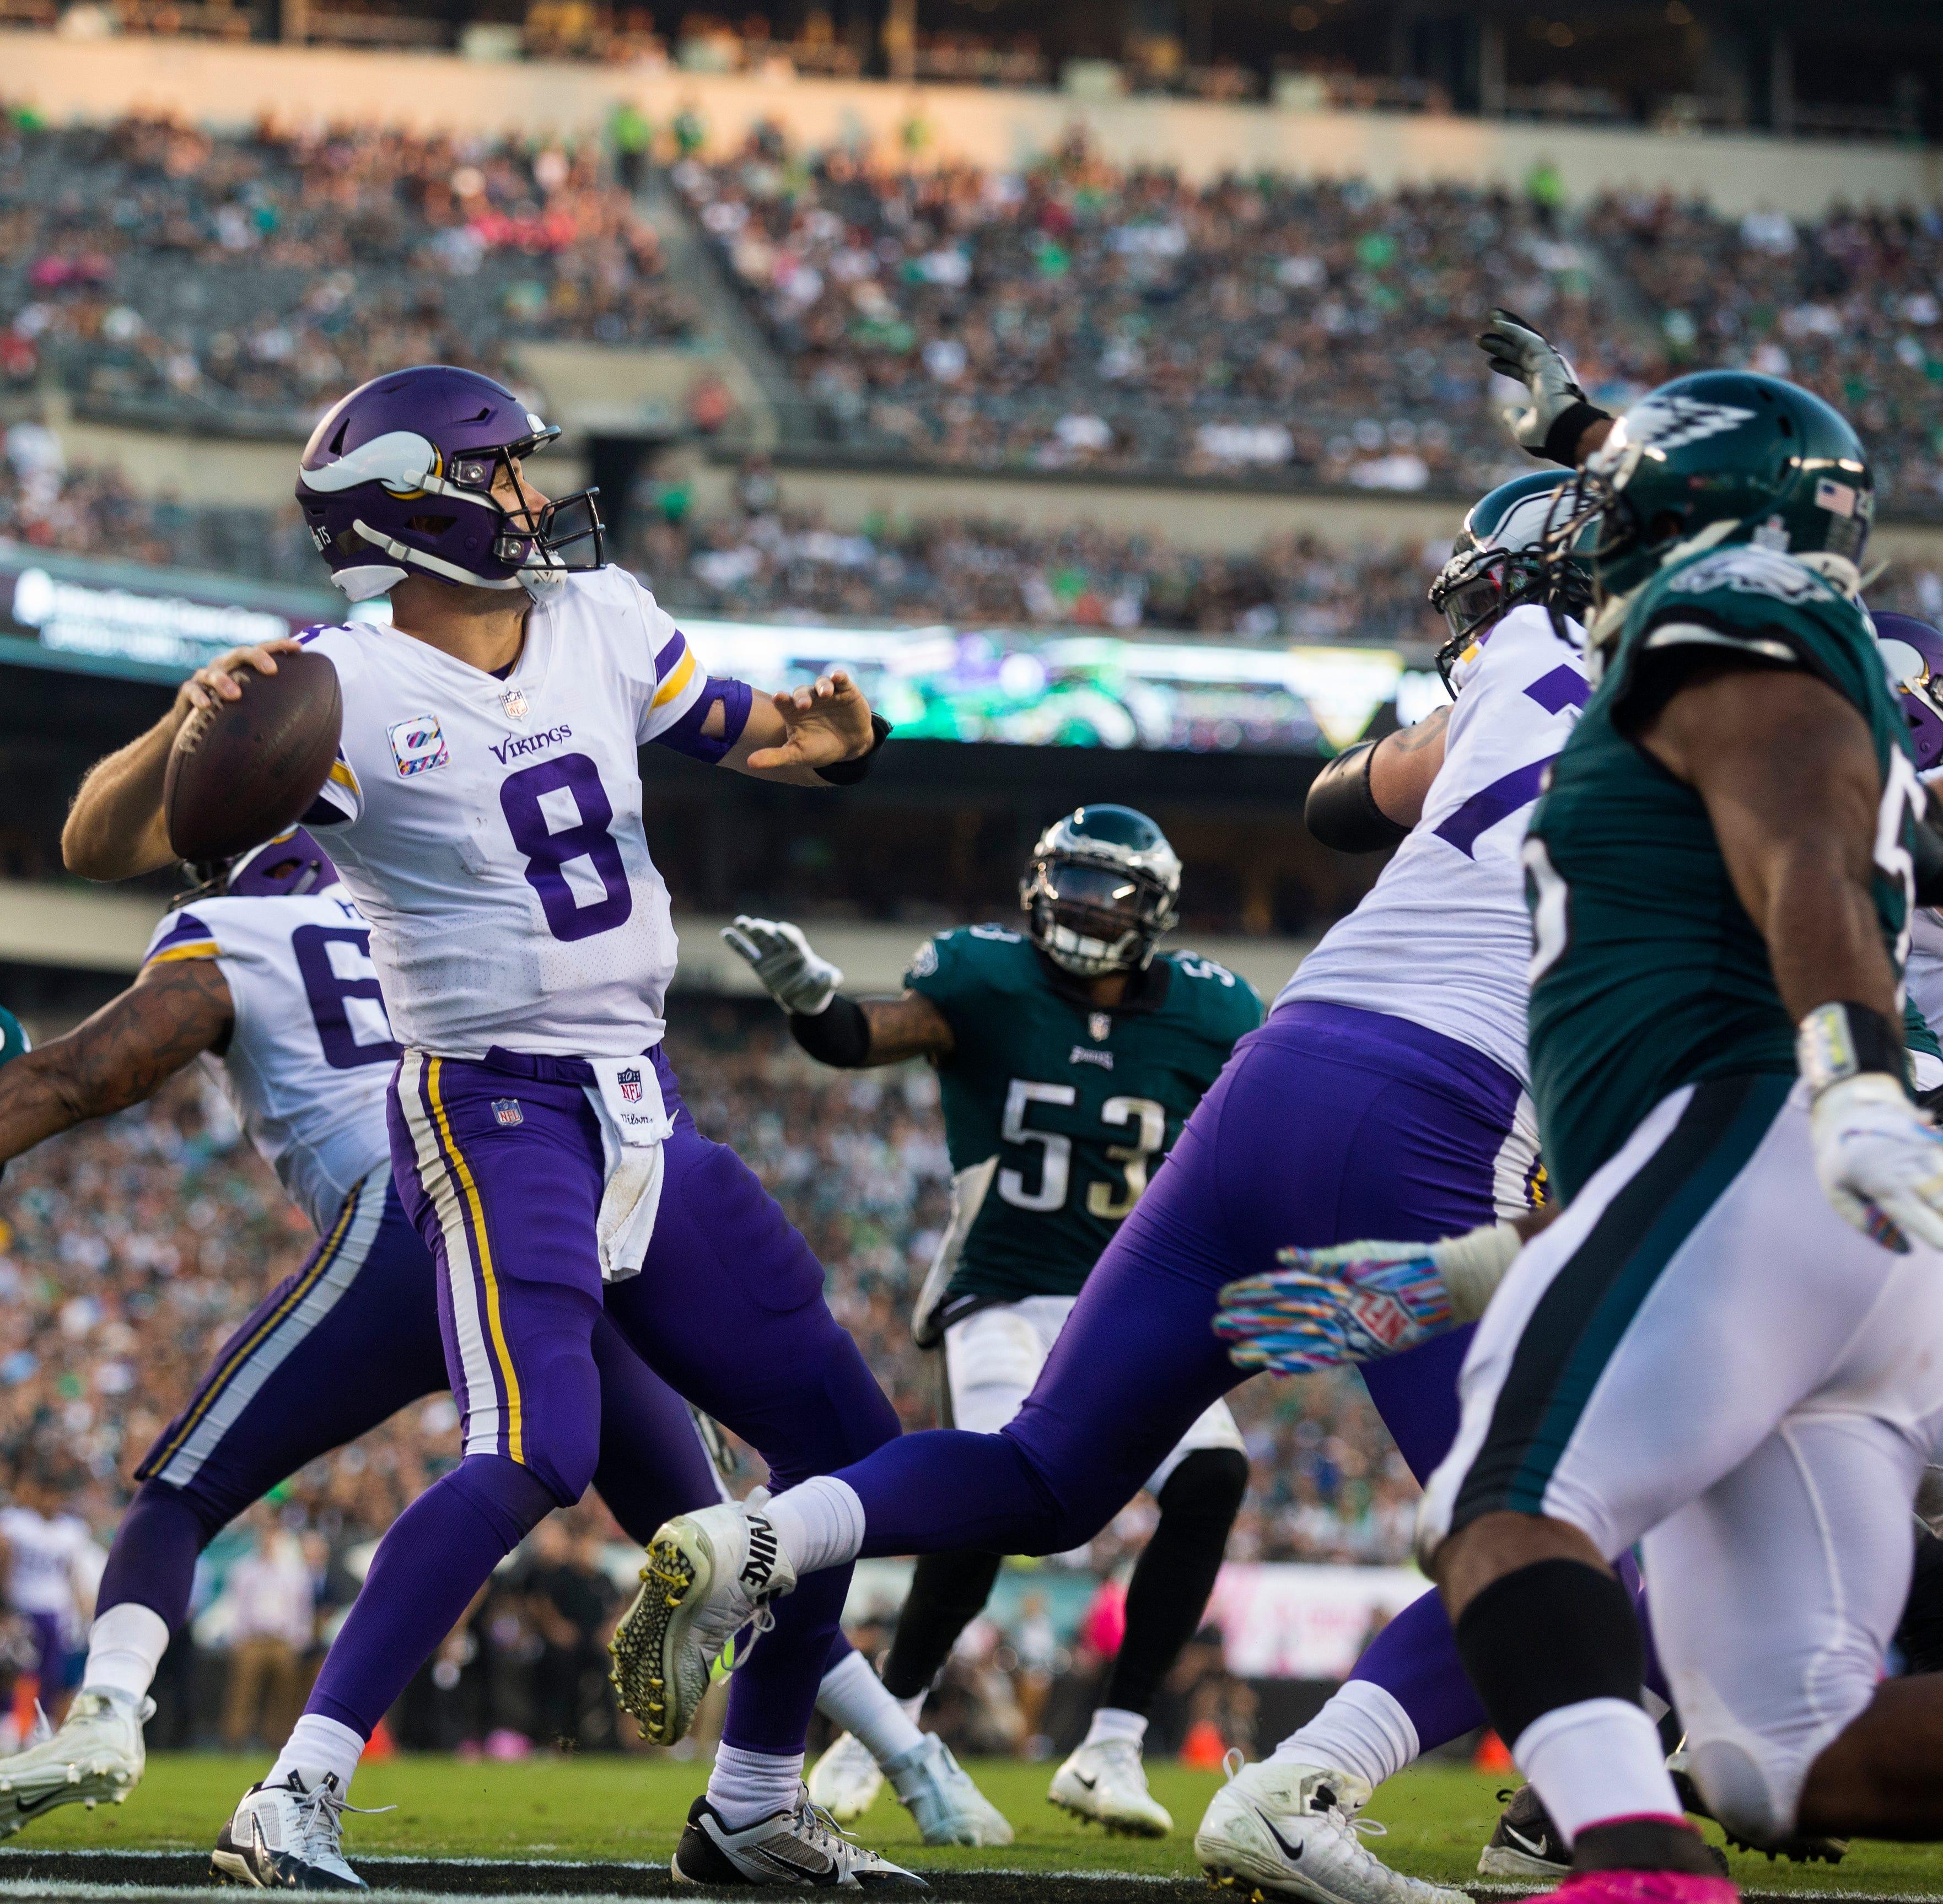 WATCH: Vikings quarterback Kirk Cousins quotes Dan Gable in pregame hype speech